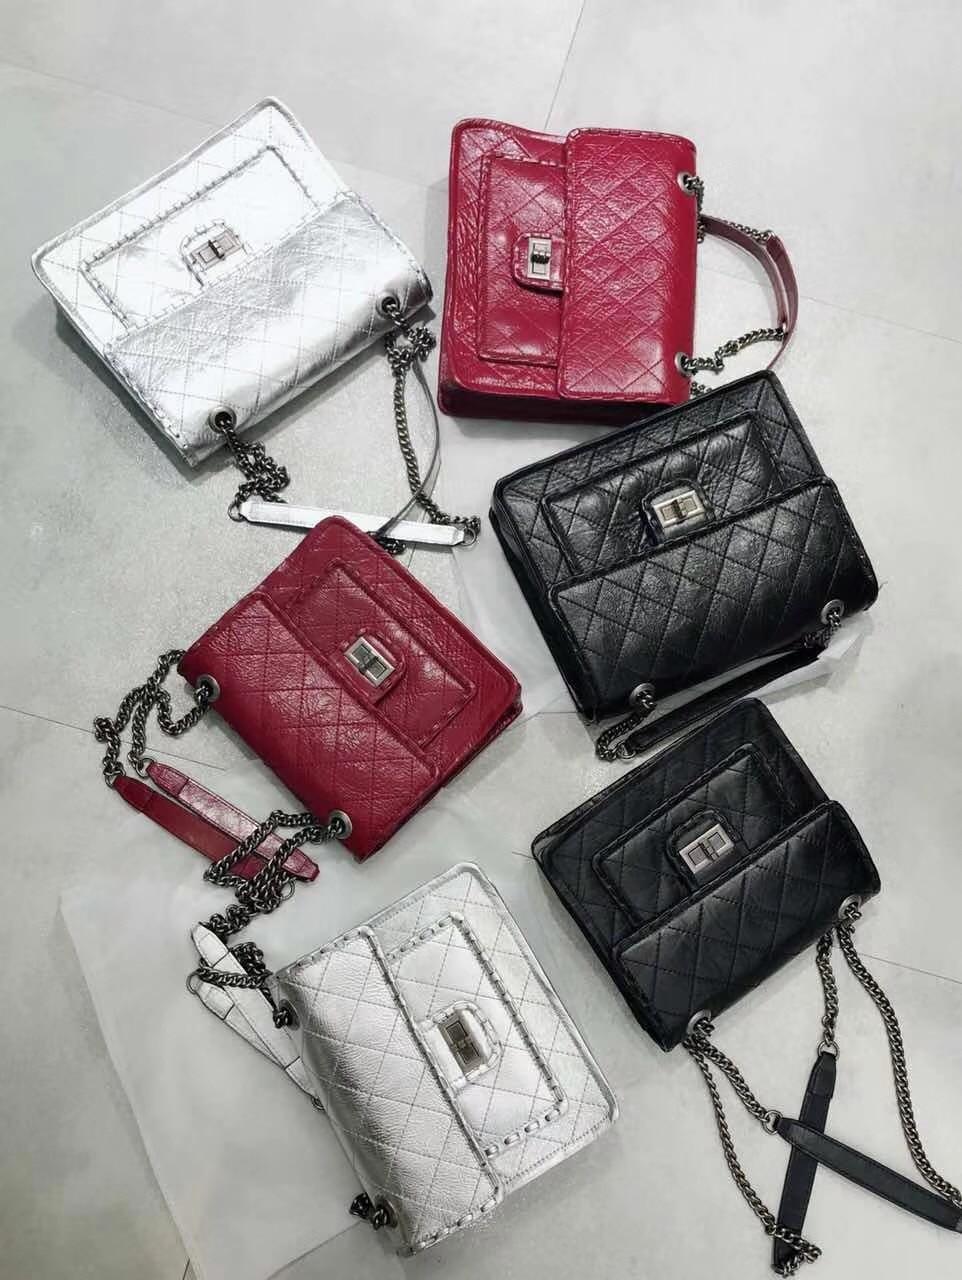 Kafunila 2018 new arrival square genuine leather women handbags famous brand designer chain ladies shoulder crossbody bags bolsa цена